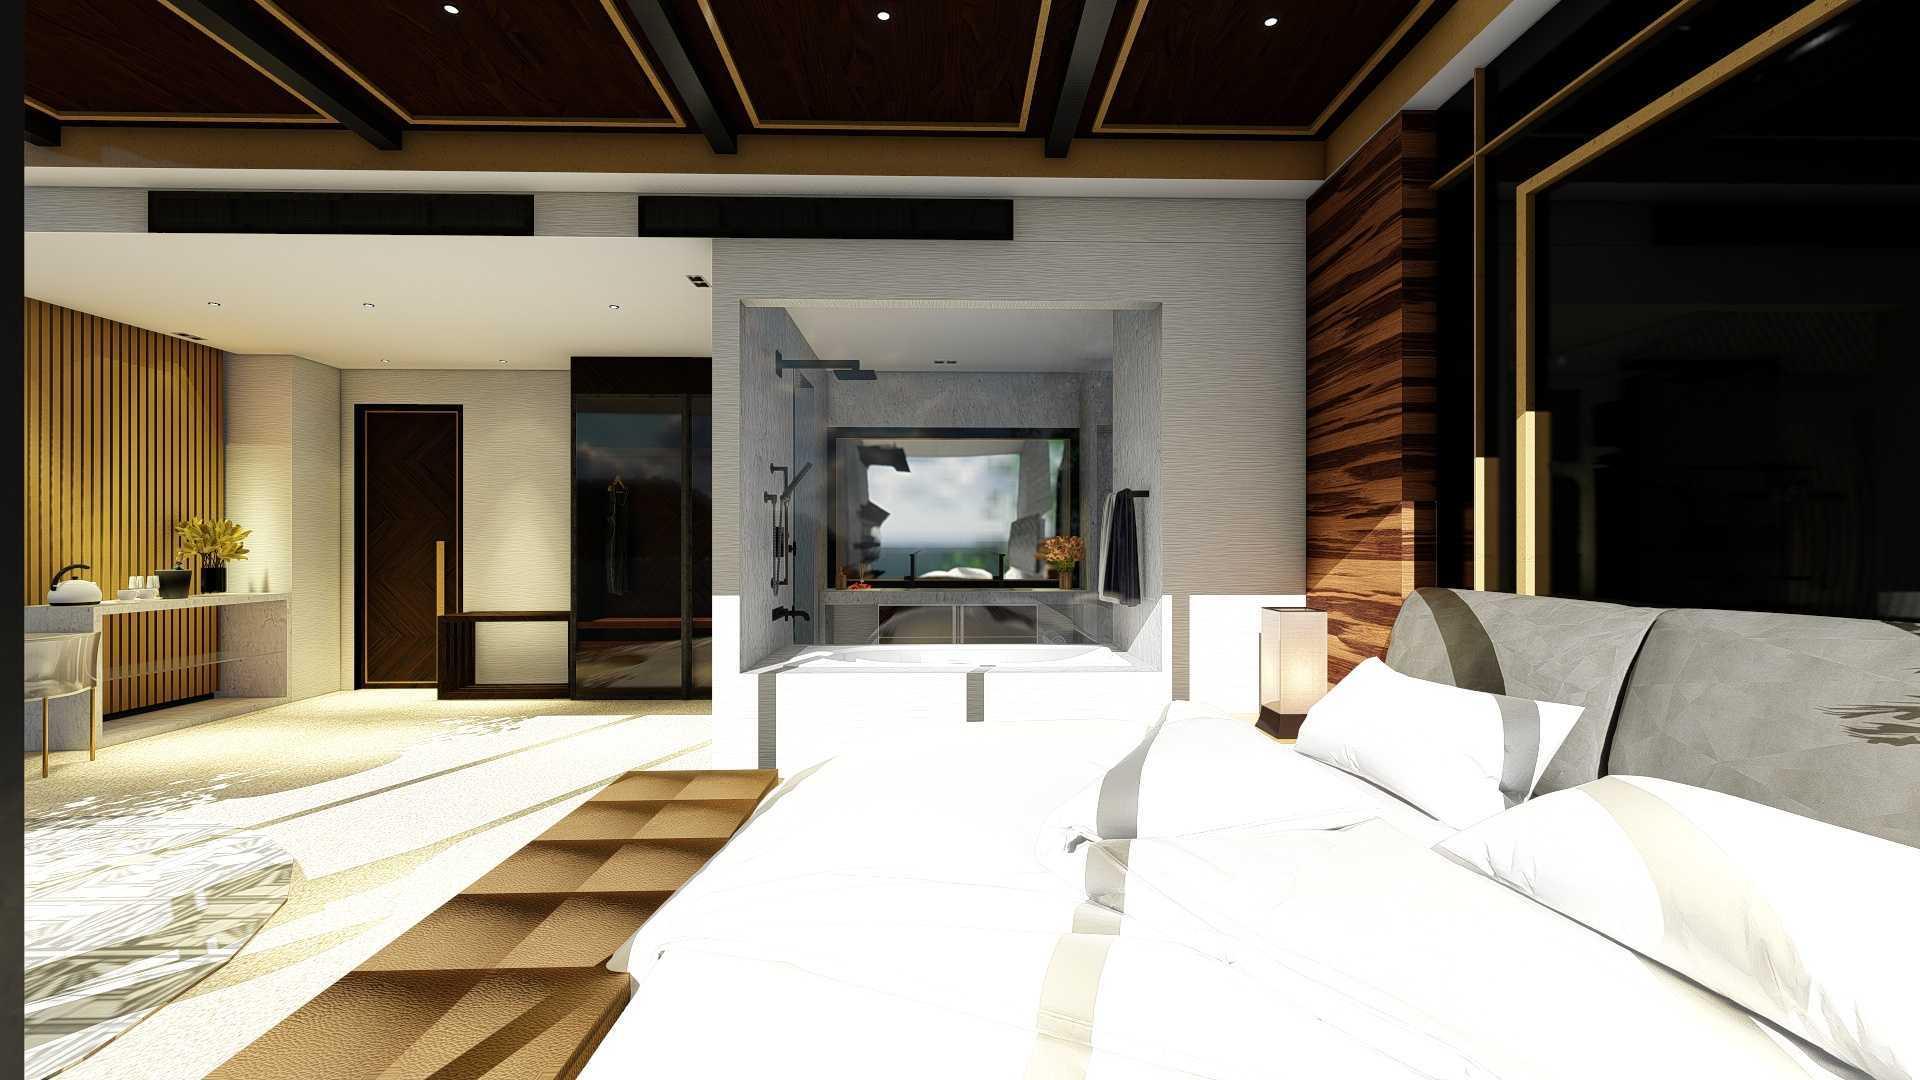 Samitrayasa Design Luxury Hotel Room Alternative 2 Jl. Kemang Raya, Bangka, Mampang Prpt., Kota Jakarta Selatan, Daerah Khusus Ibukota Jakarta, Indonesia  405   32663